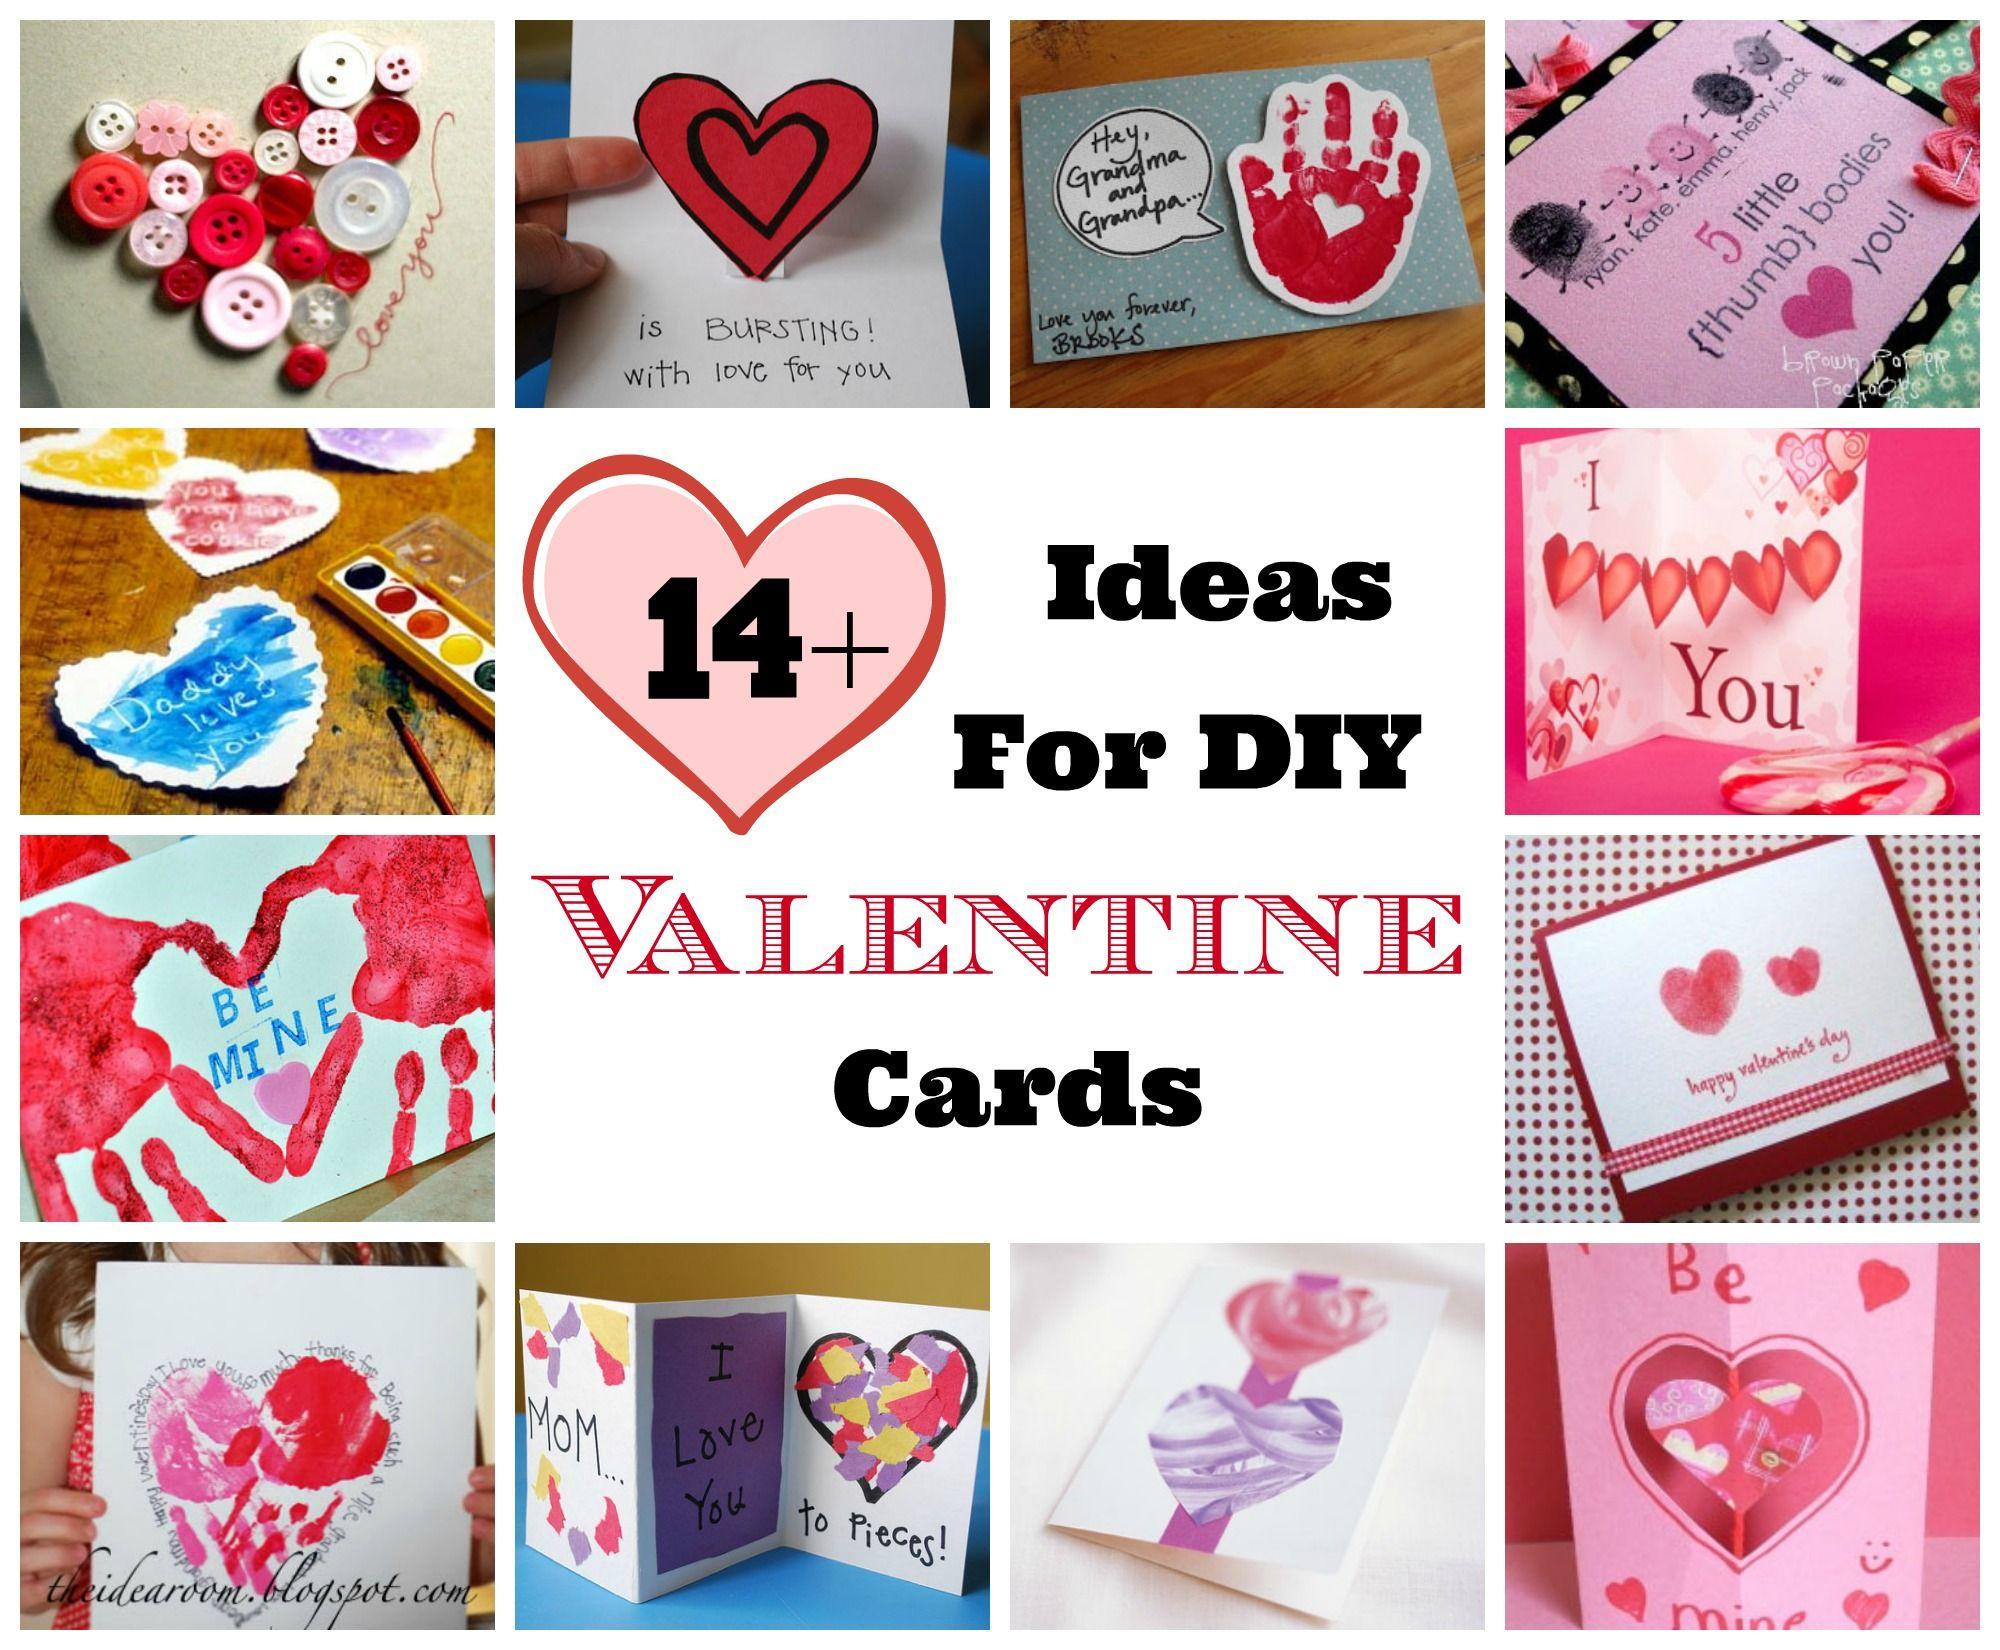 14+ Creative Ideas for DIY Homemade Valentine Cards | Valentine\'s ...